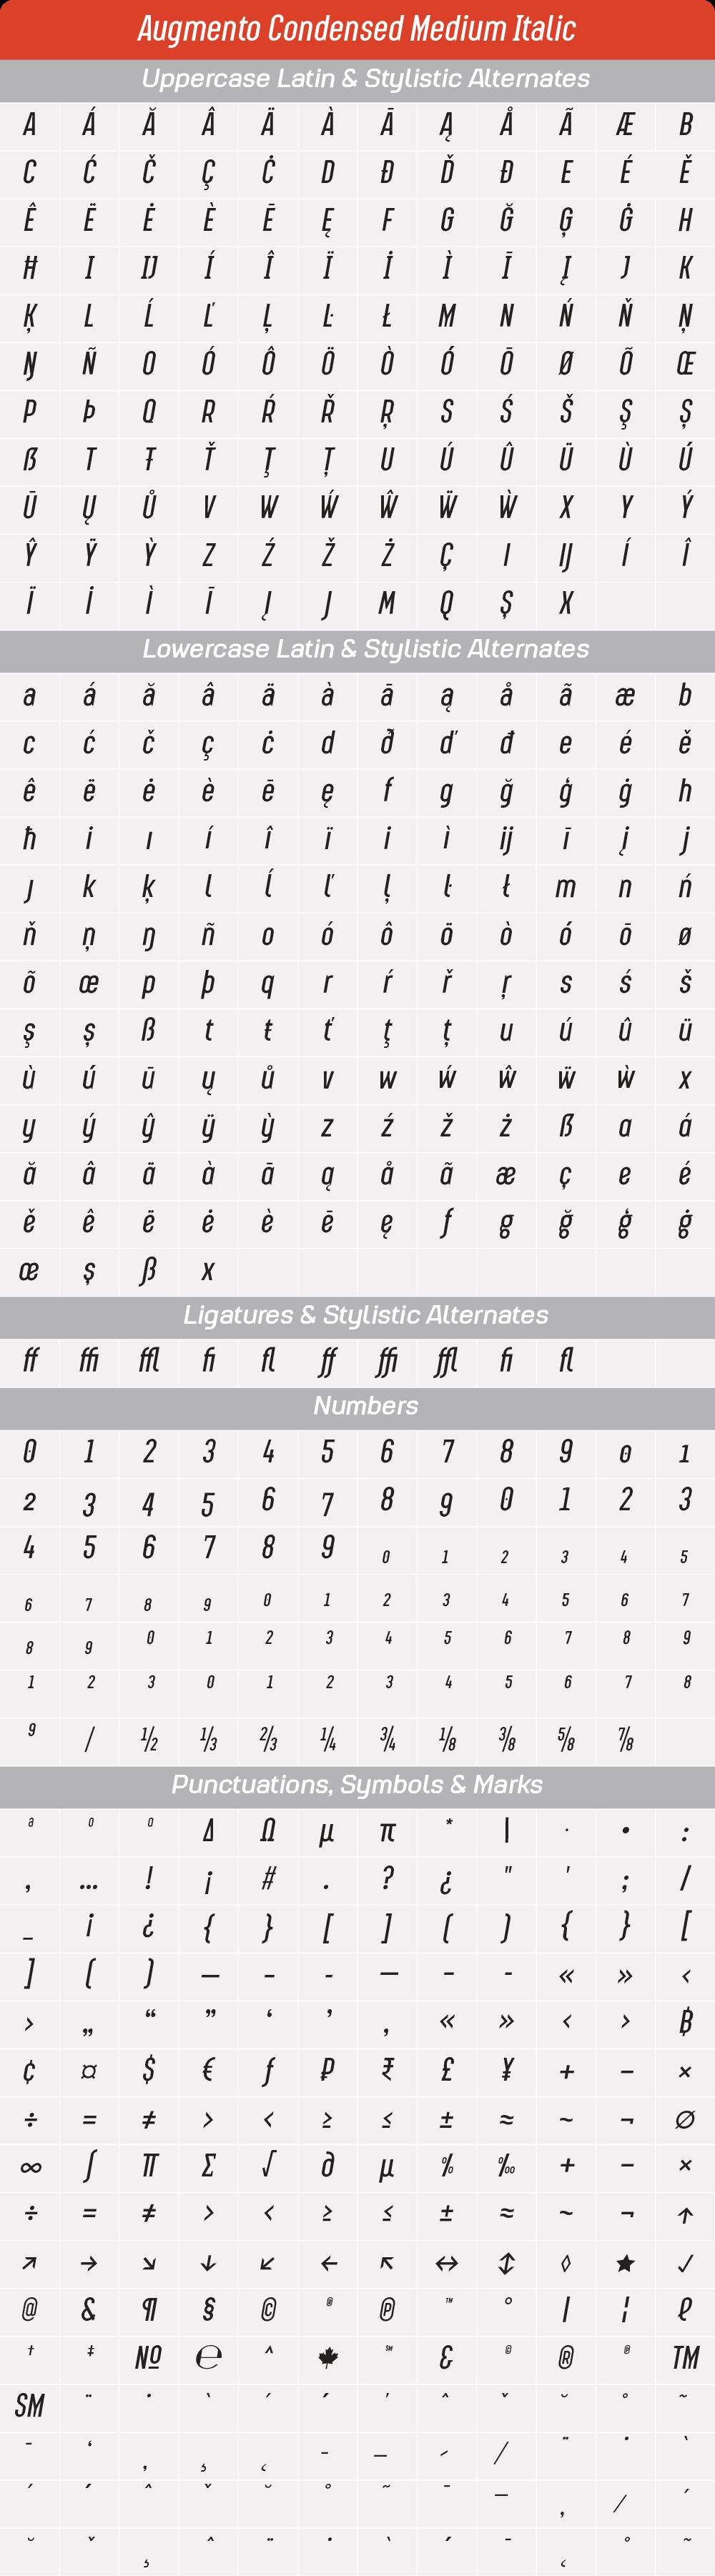 Condensed Medium ItalicAugmento-GlyphTable.png